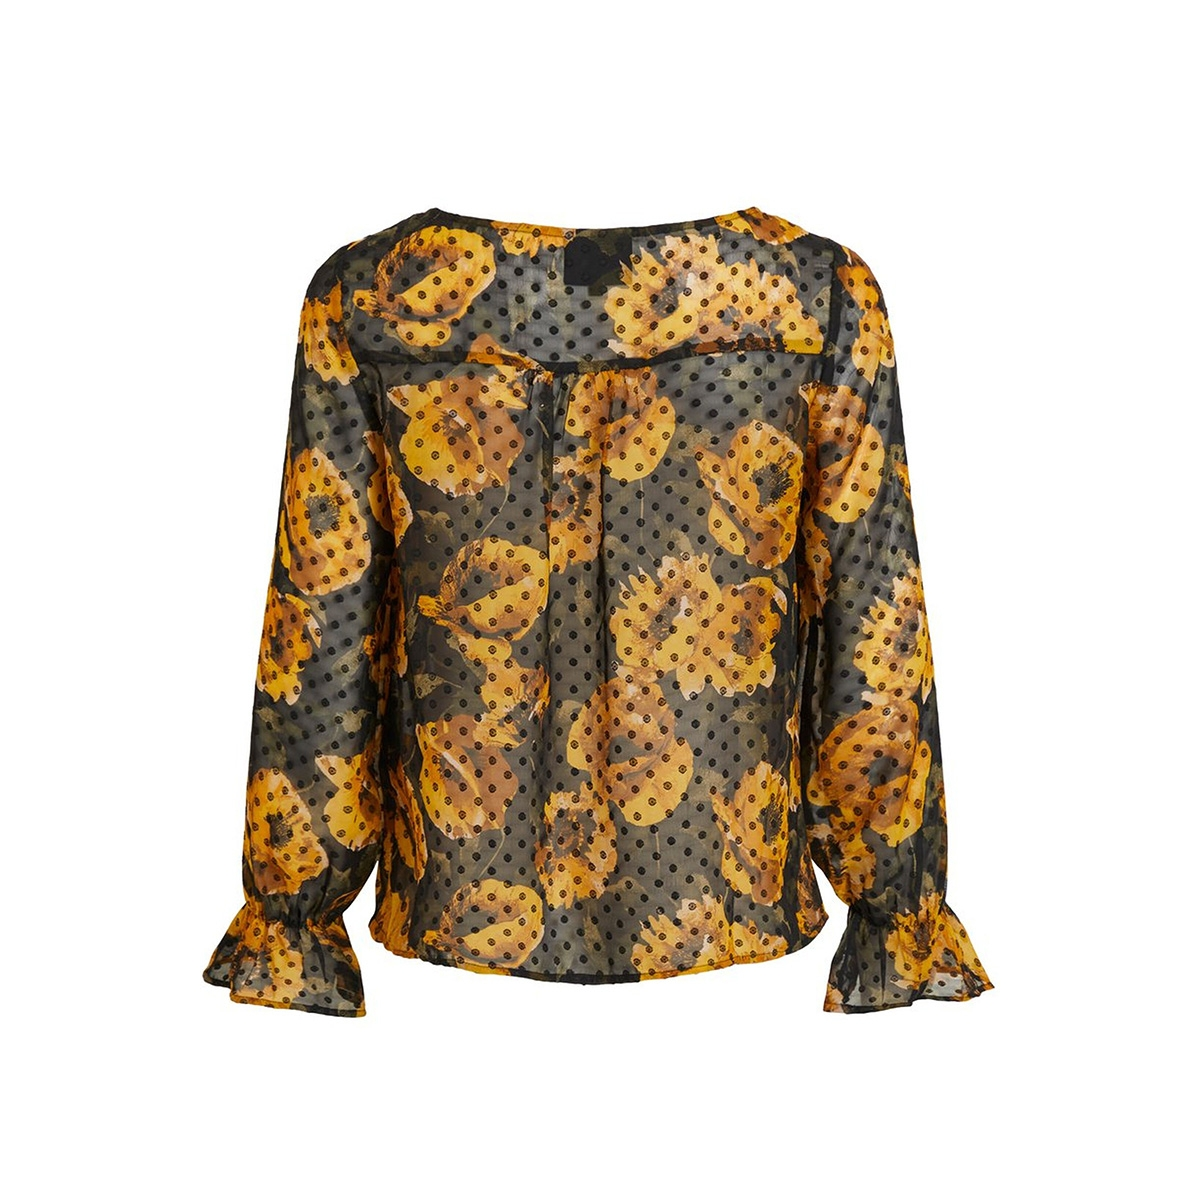 objelodia l/s blouse a wi 23032576 object t-shirt black/elodia floral